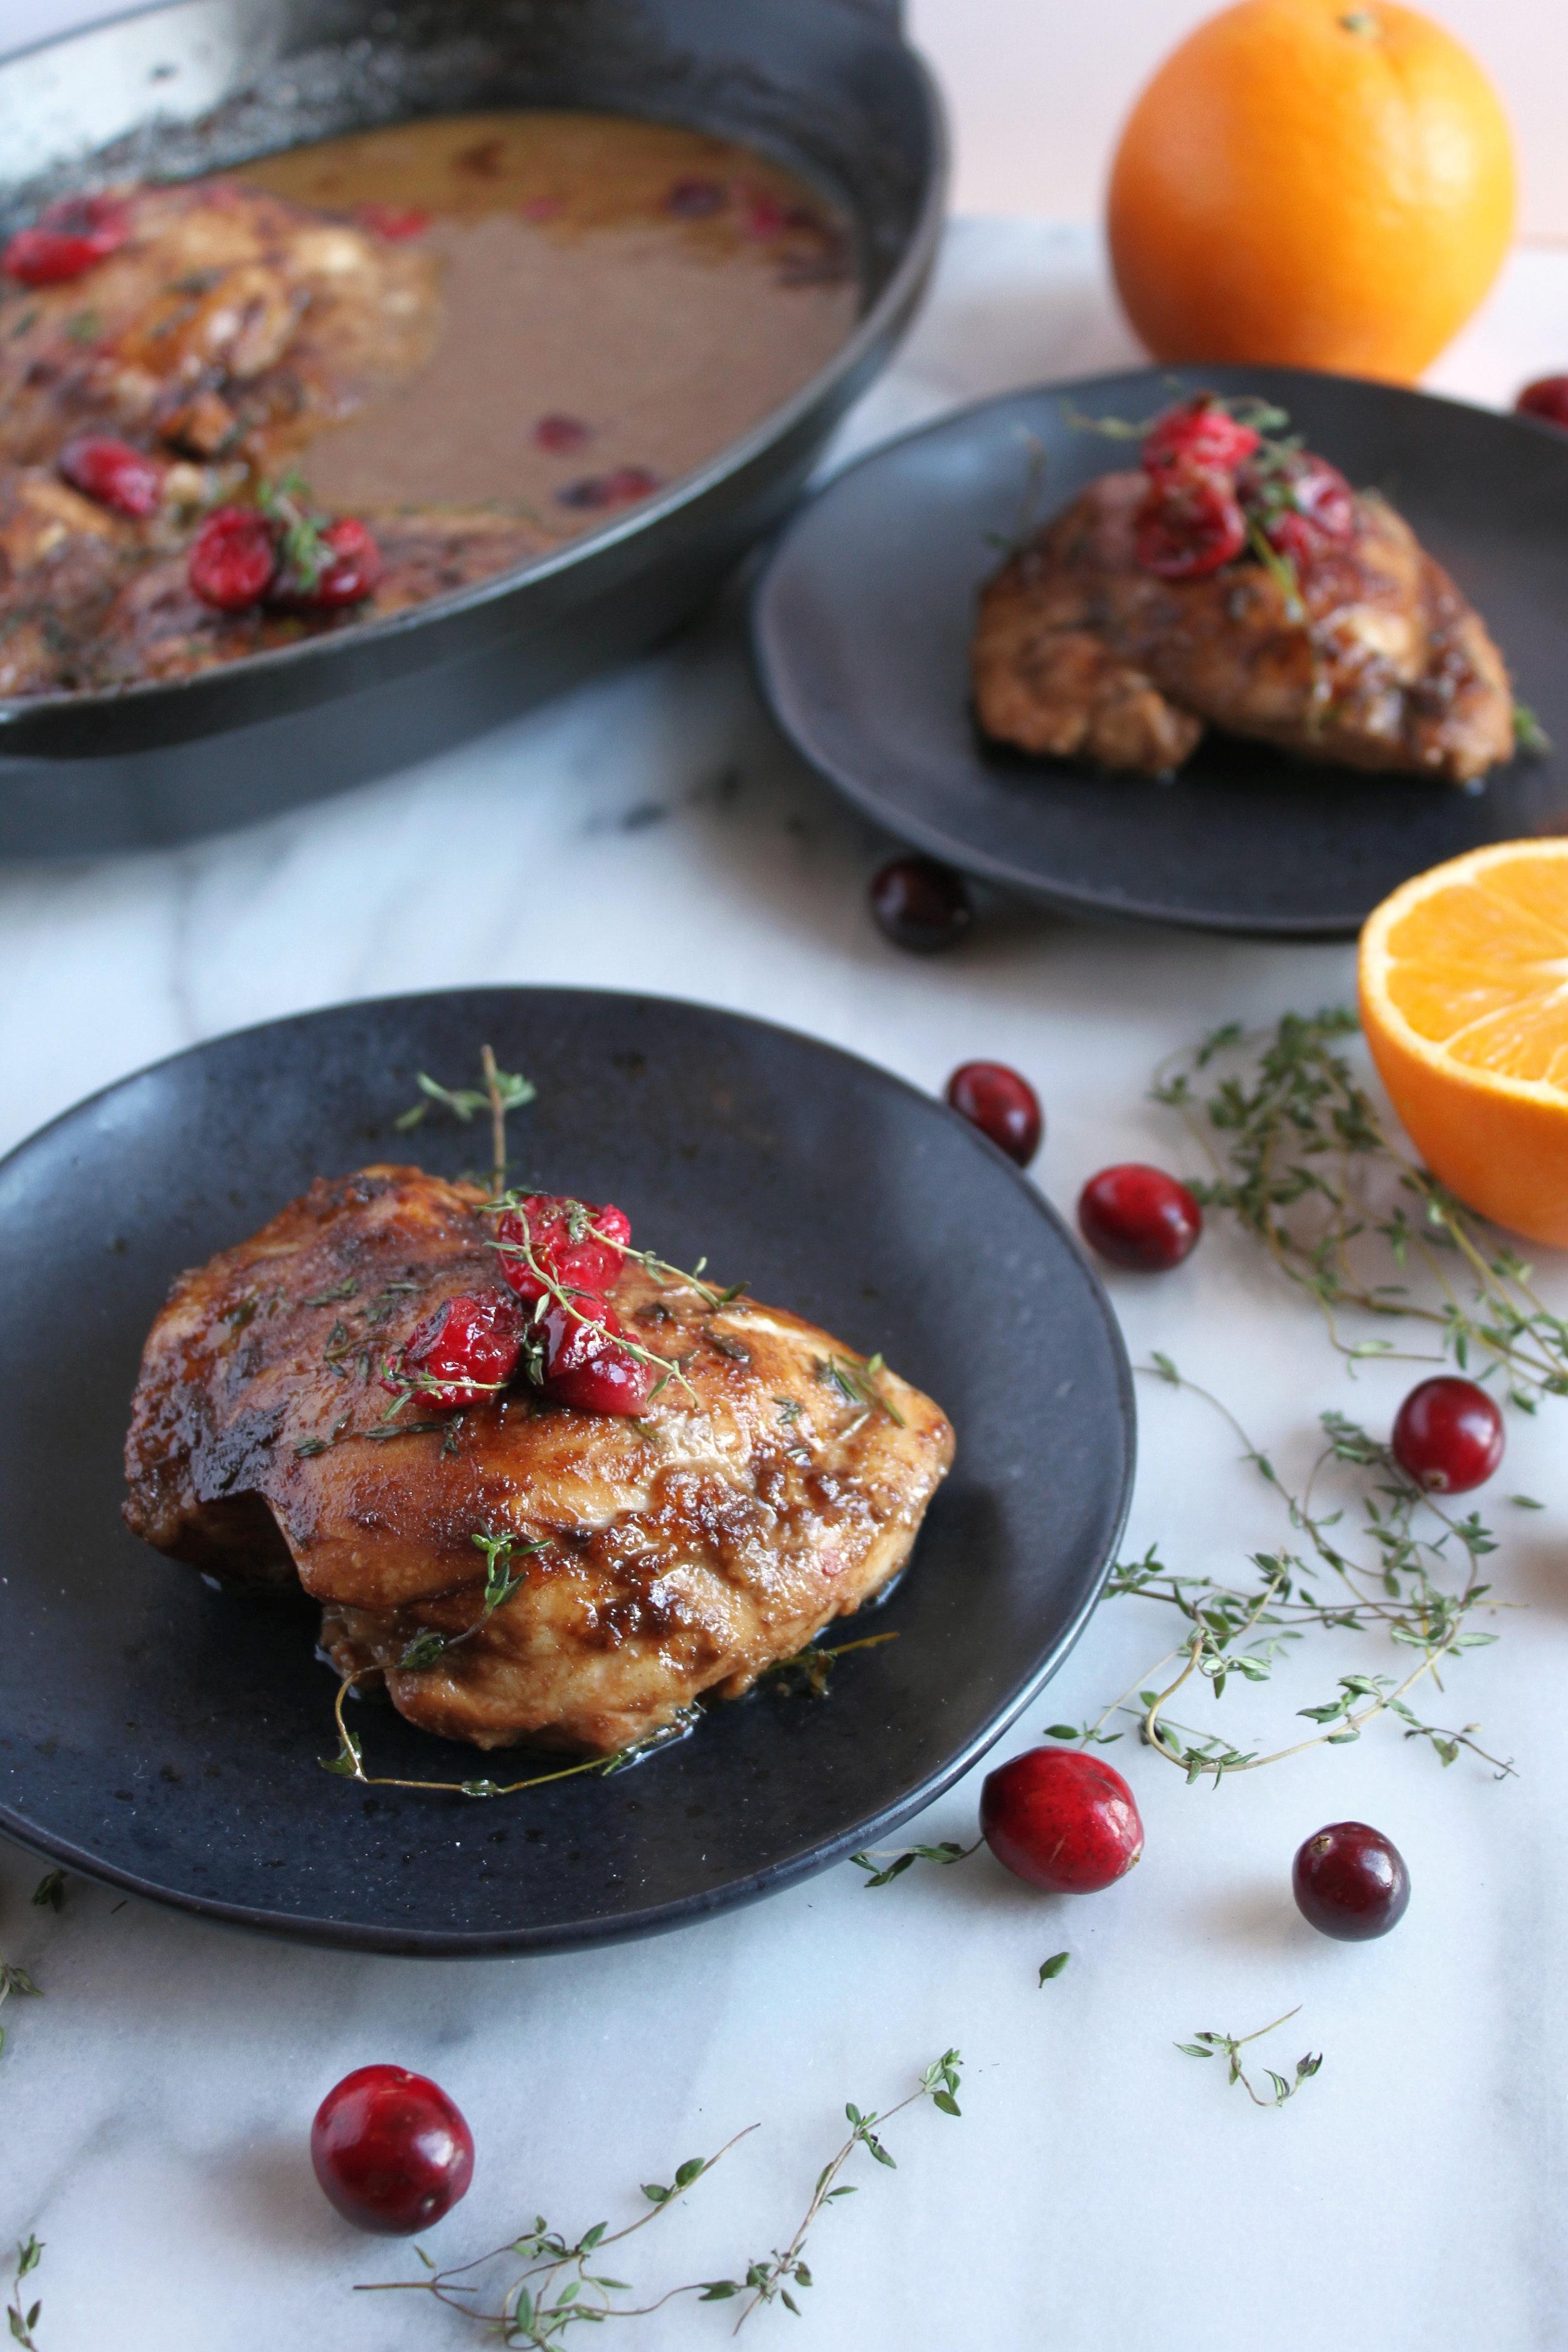 Roasted Cranberry Orange Maple Chicken w:Vitamix x Living Minnaly _22.jpg